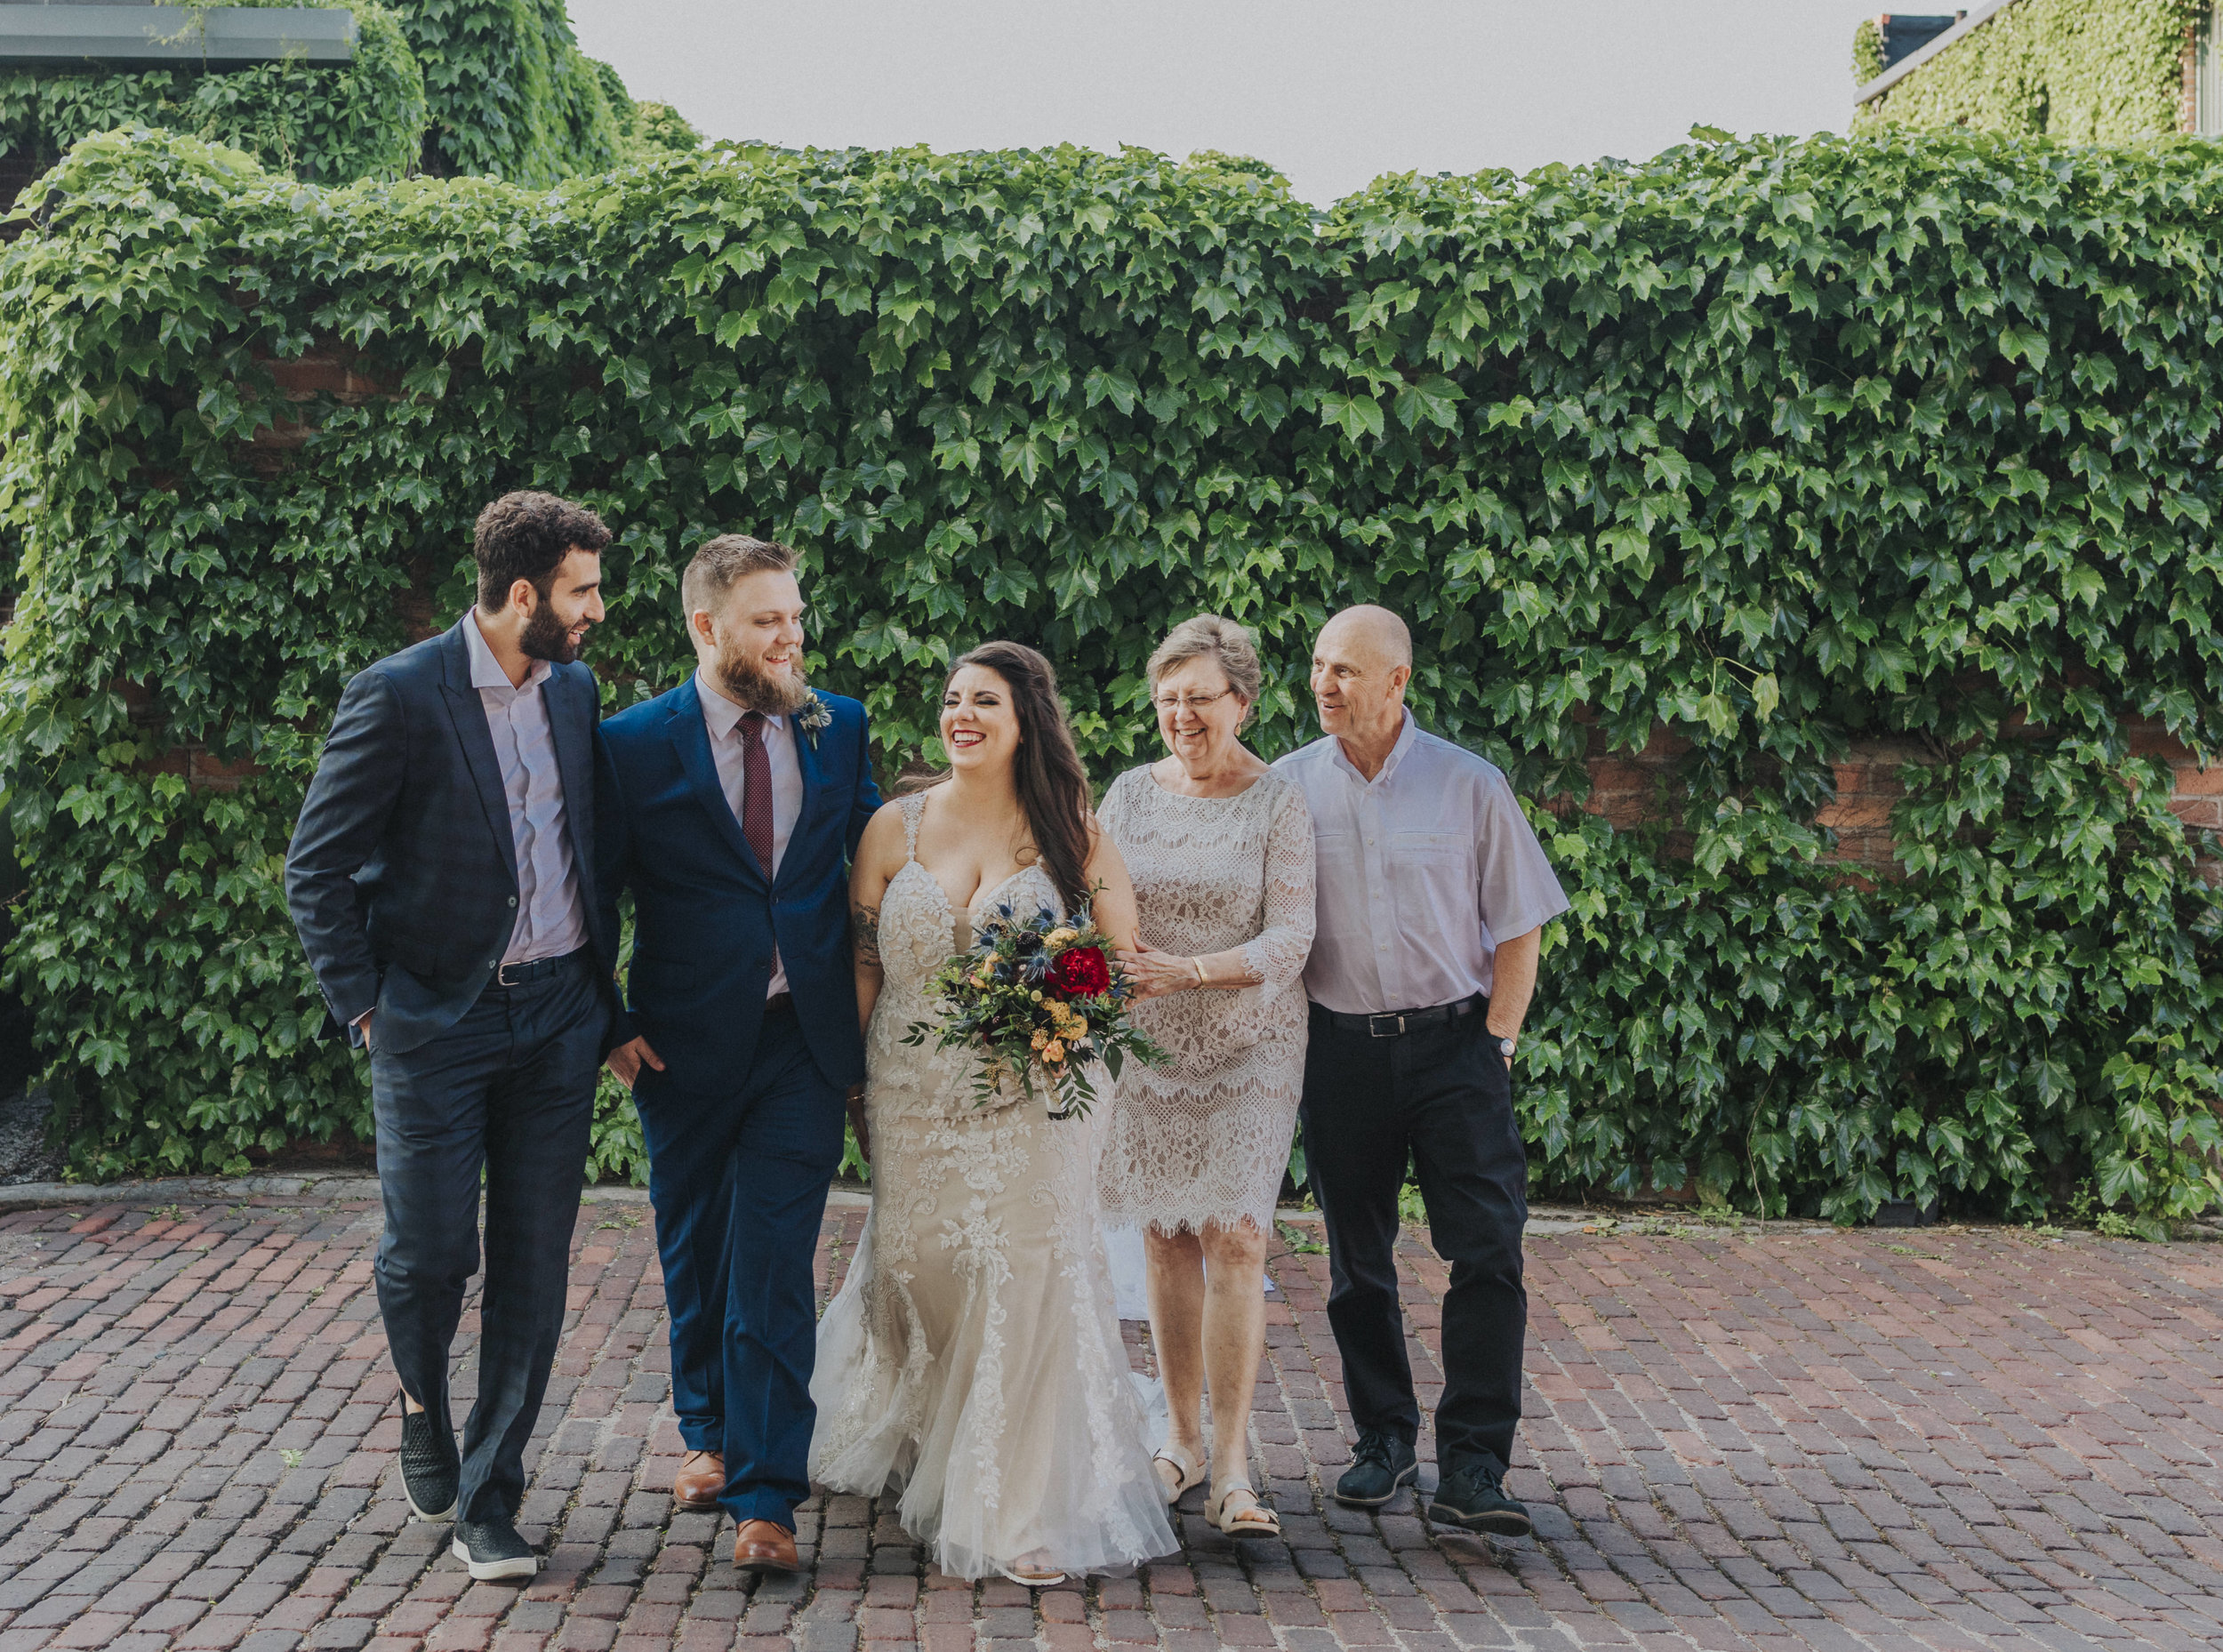 133 tiny-luxe-weddings-custom-elopement-summer-omaha-old-market.jpg